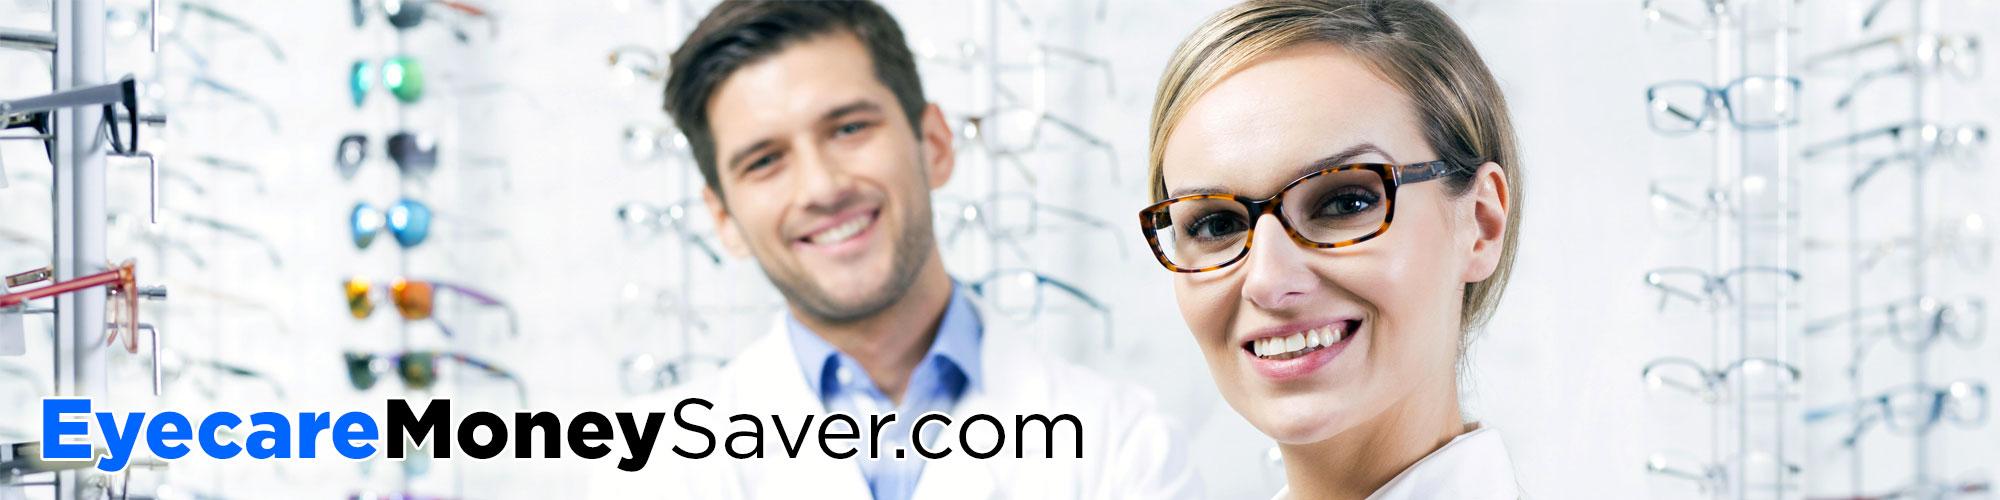 Online Eyecare & Contact Lenses